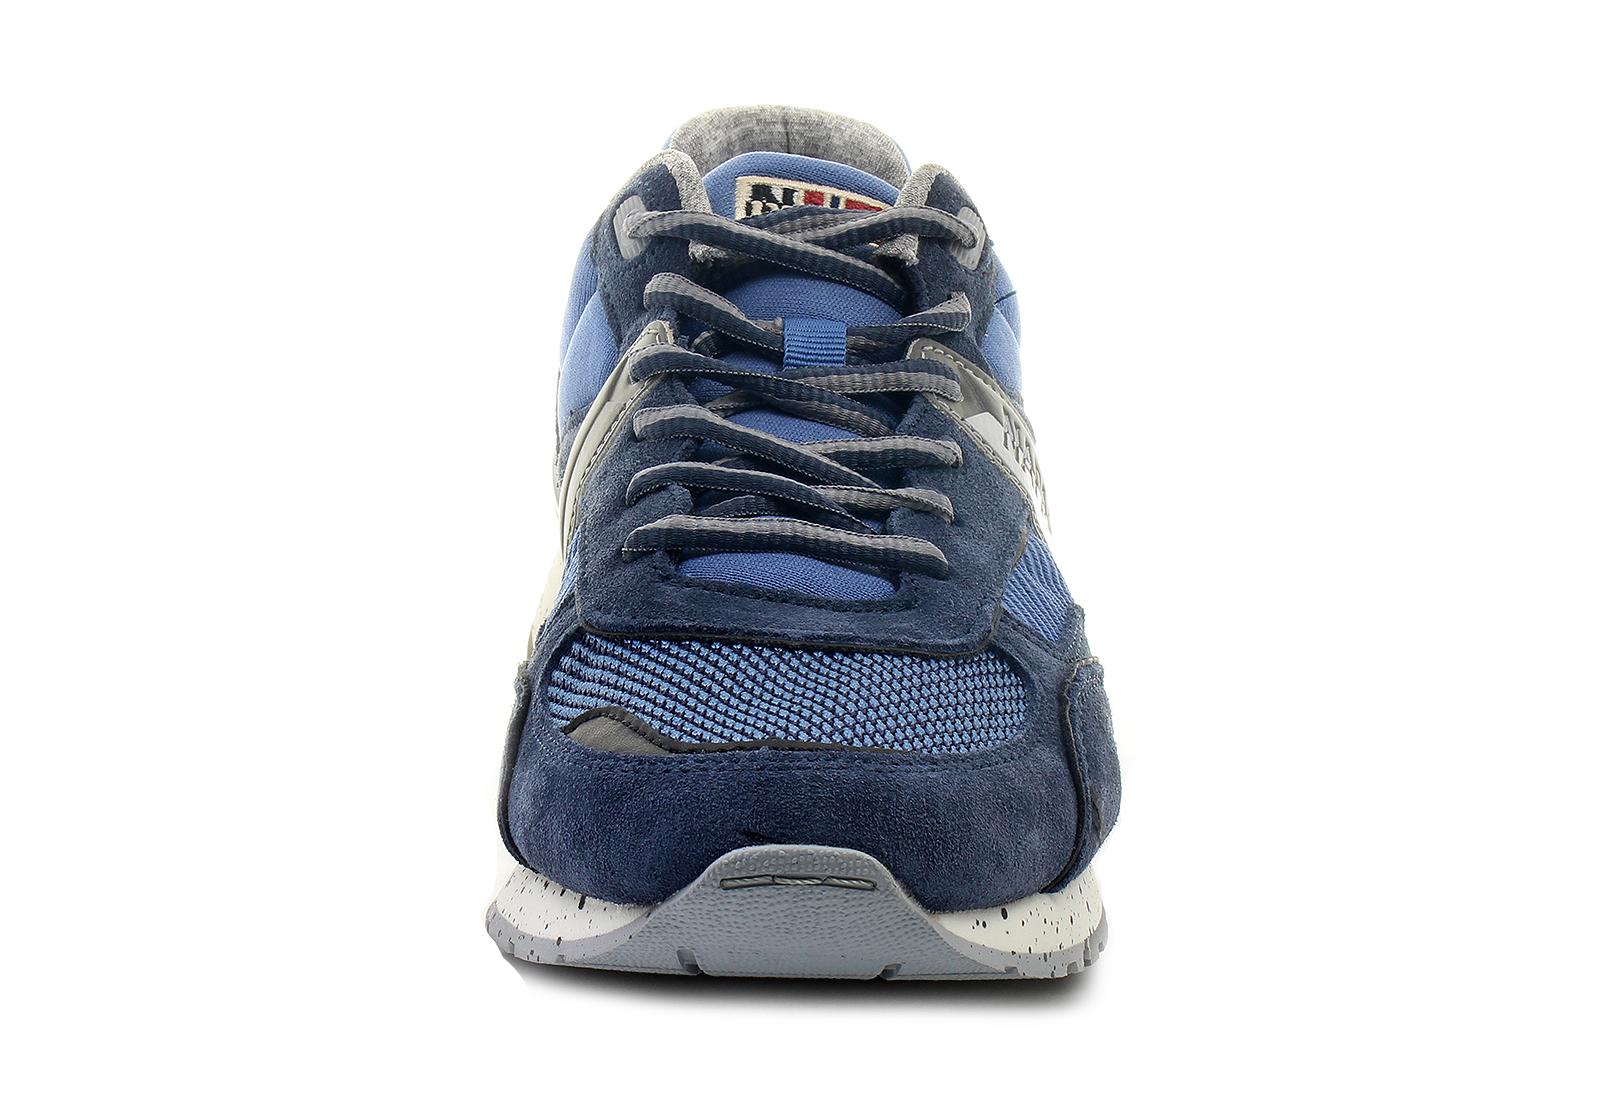 c7160475ccfc Napapijri Shoes - Rabari - 14833753-N65 - Online shop for sneakers ...